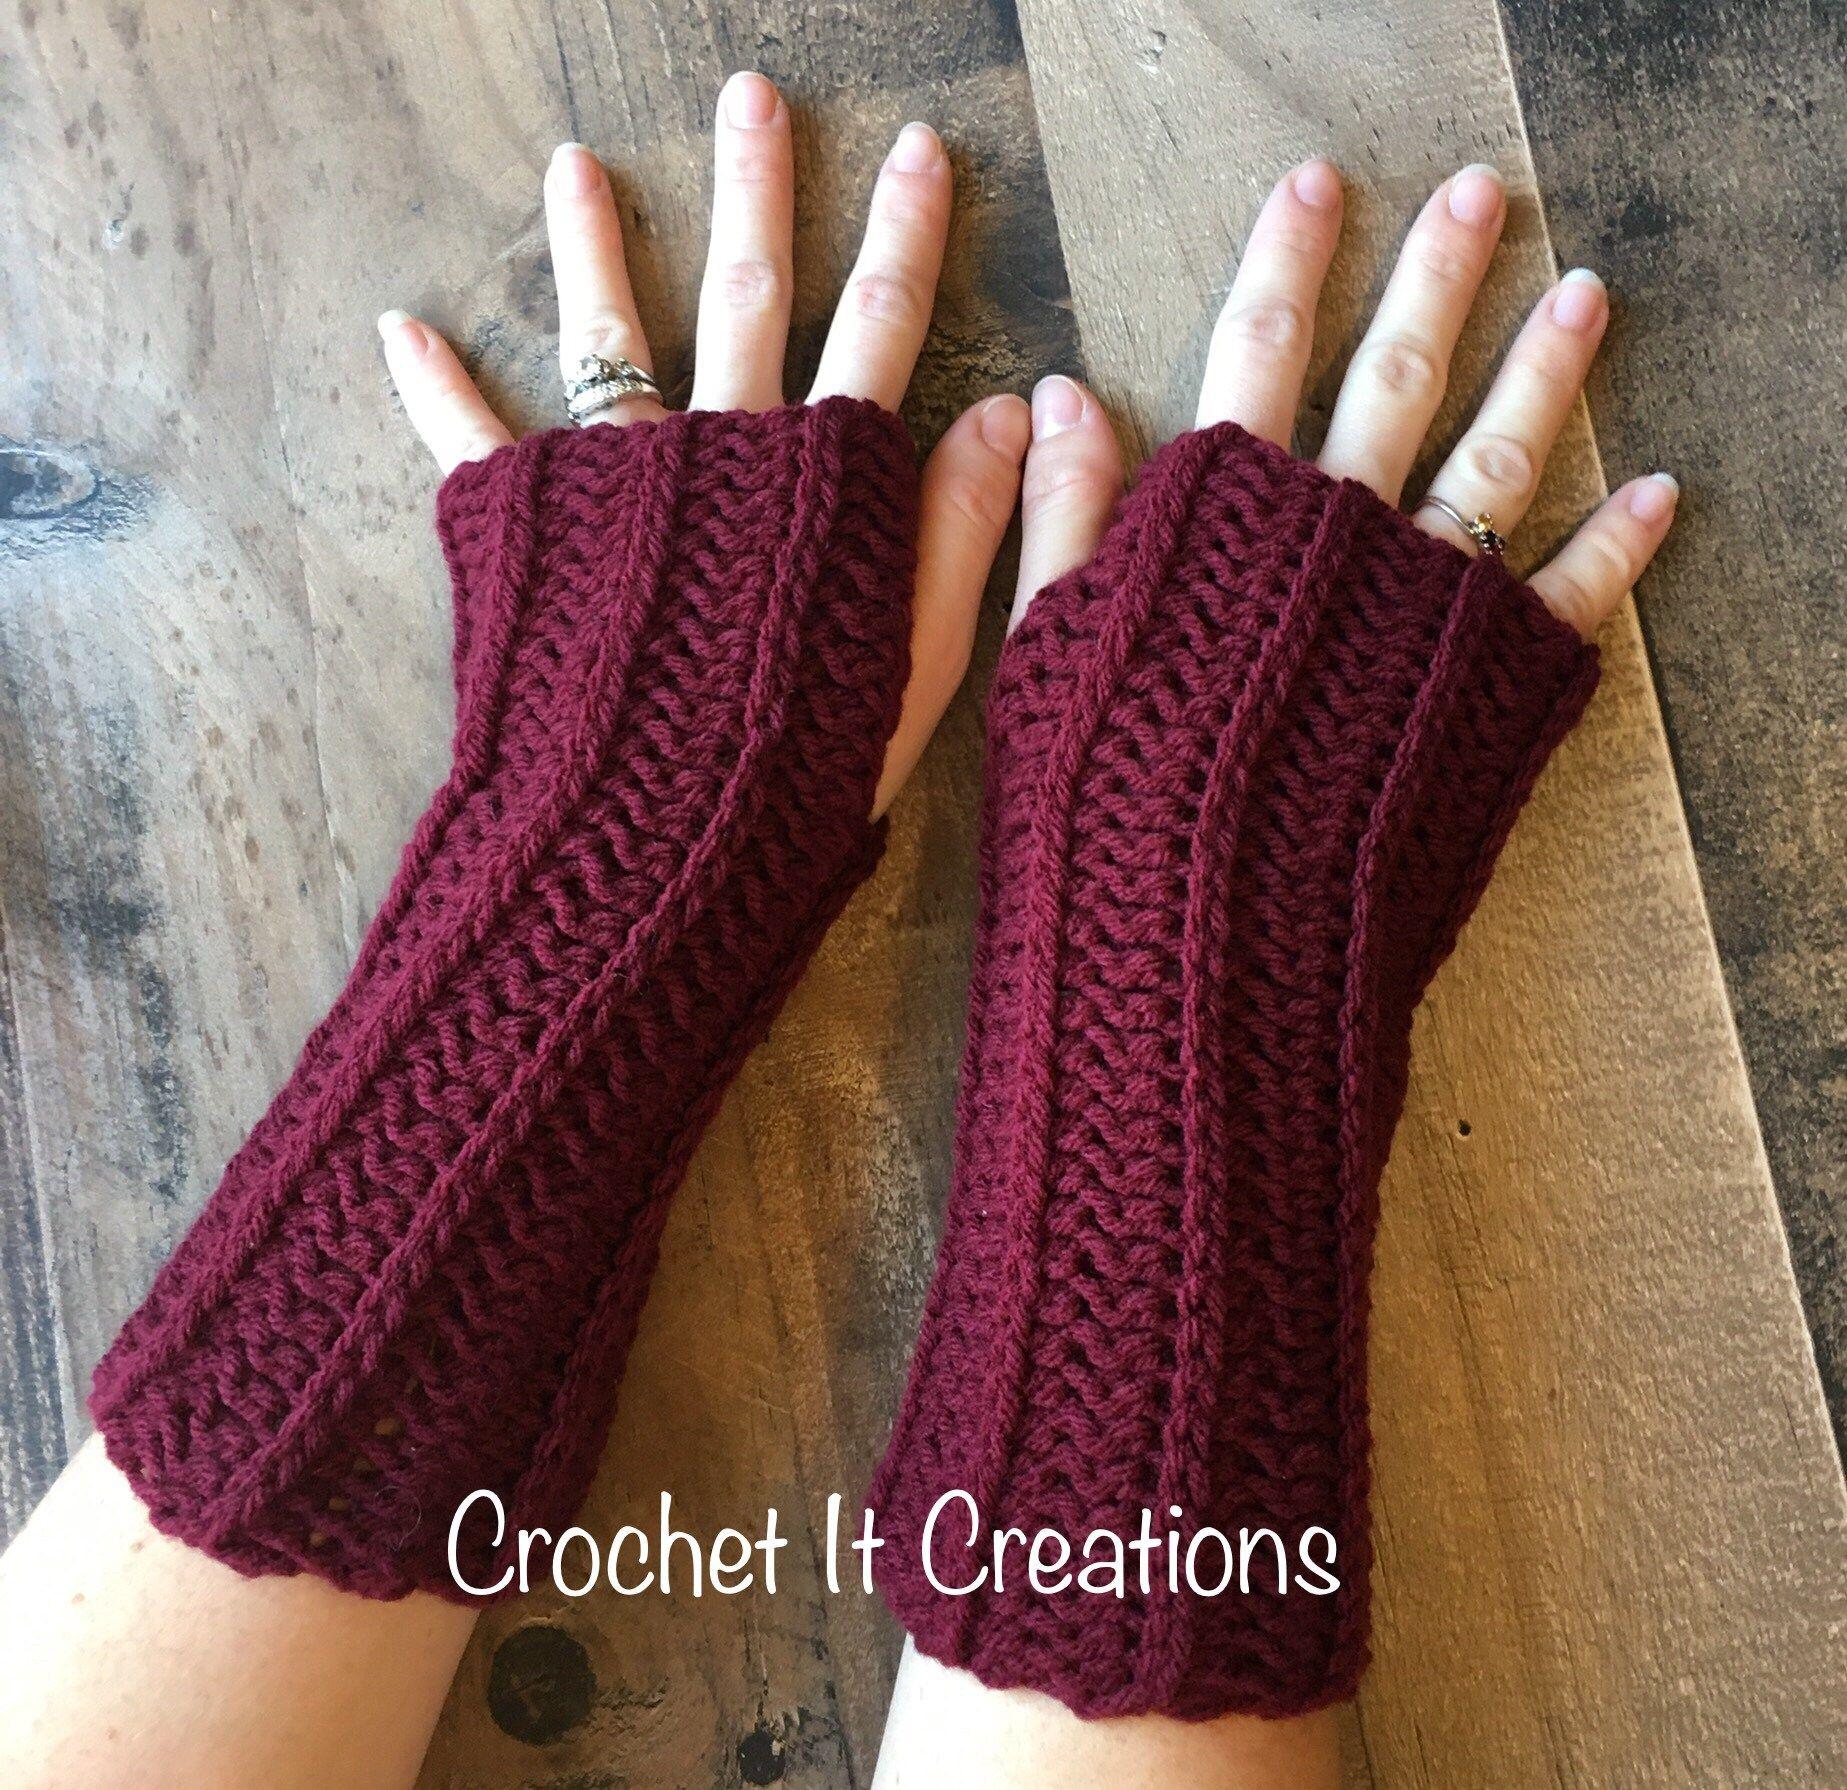 FREE Camel Stitch Fingerless Gloves Crochet Pattern - Crochet it Creations #gloves